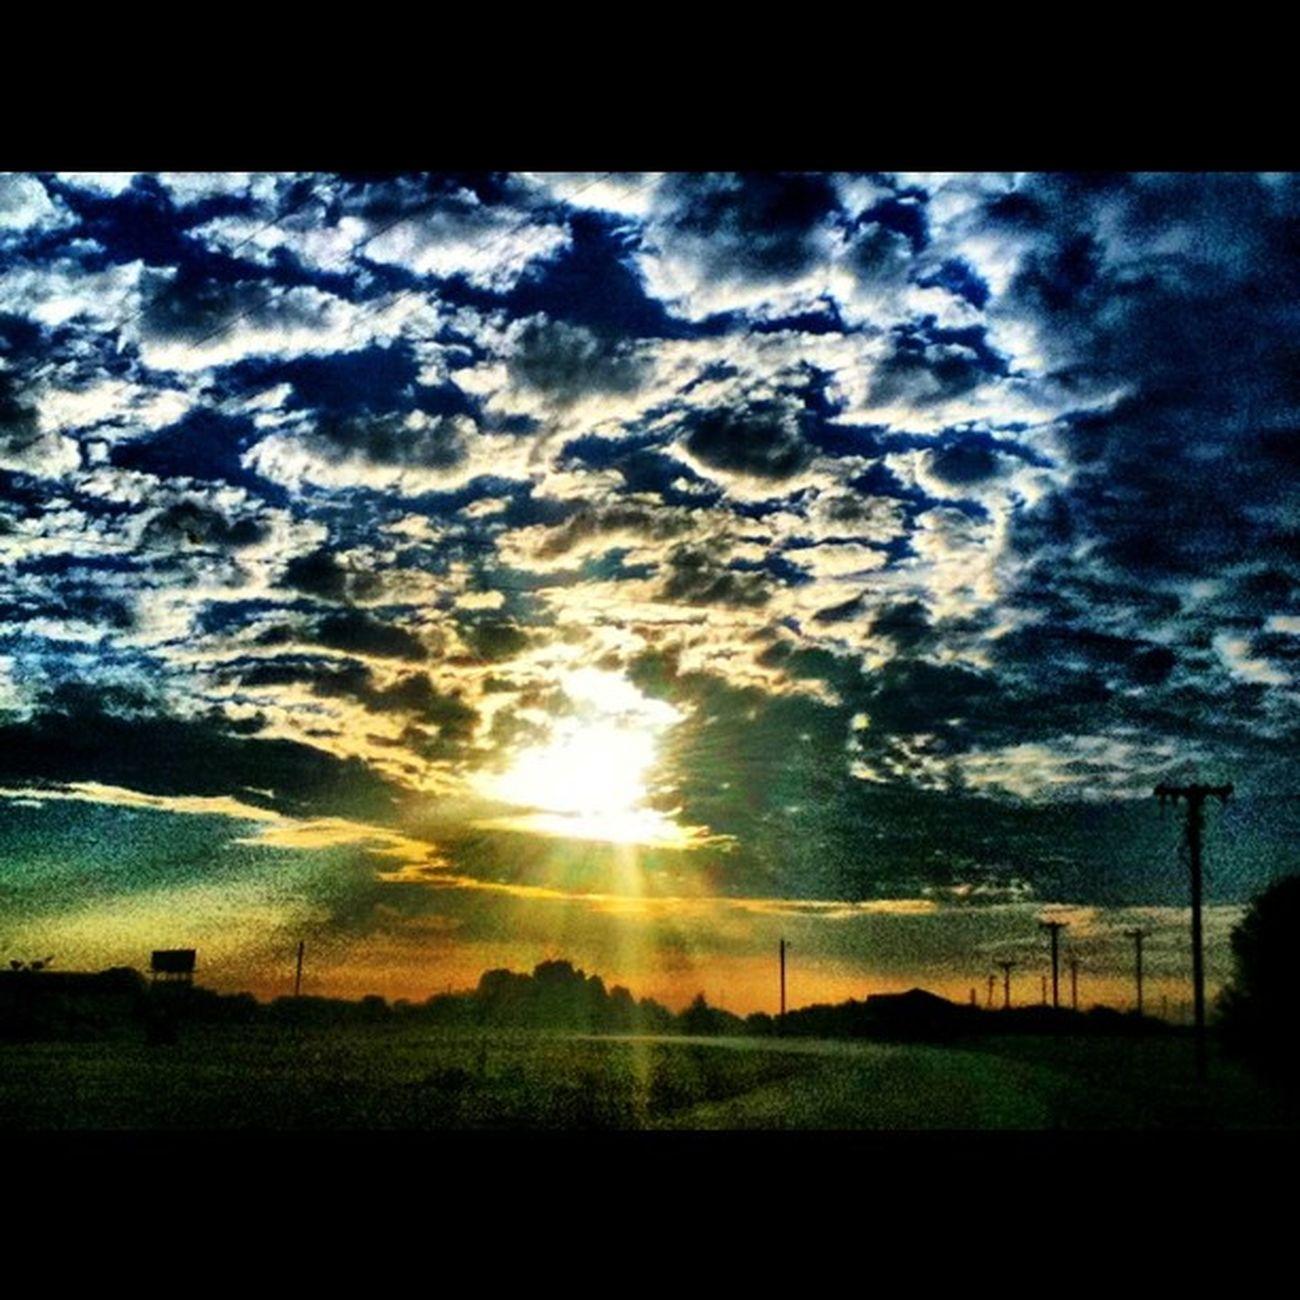 Sunset Sky Cloudporn Photooftheday Instagram Jj  30likes 20likes Jj_forum Teg Dynamiclight Ipone4